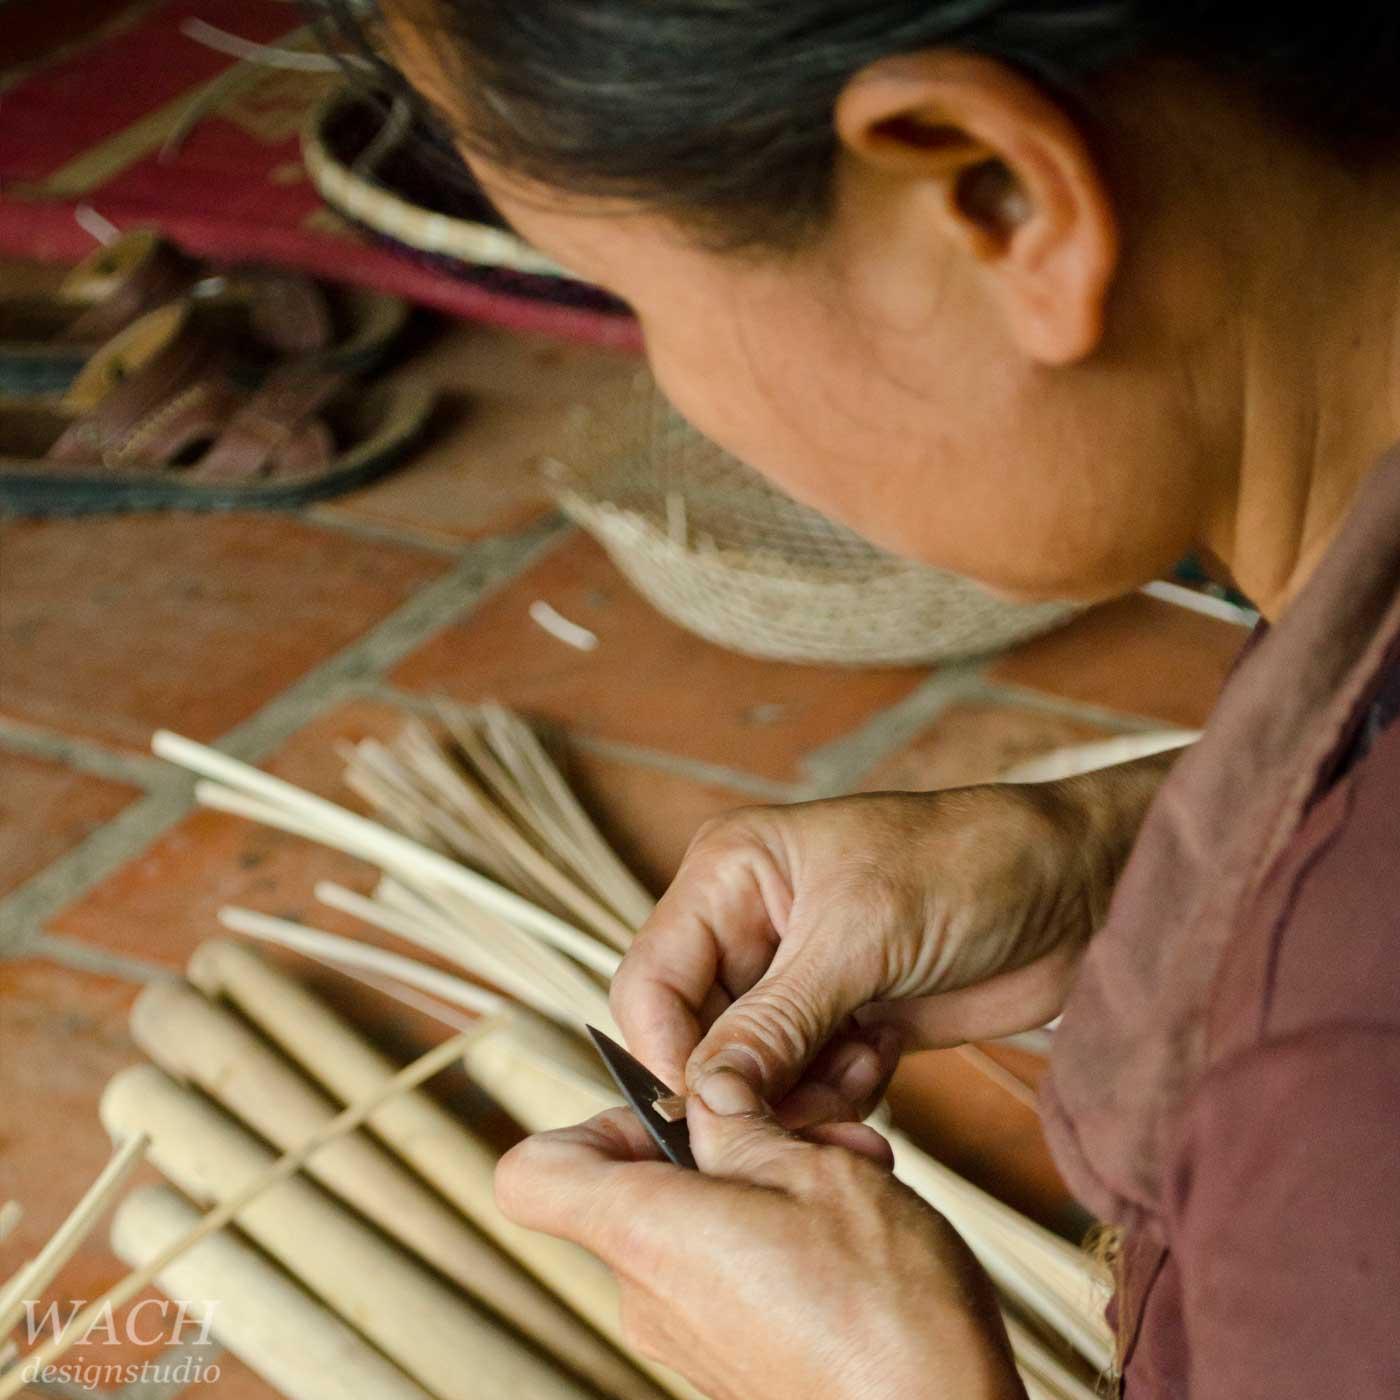 Vietnamese women crafting bamboo stripes for basket weaving